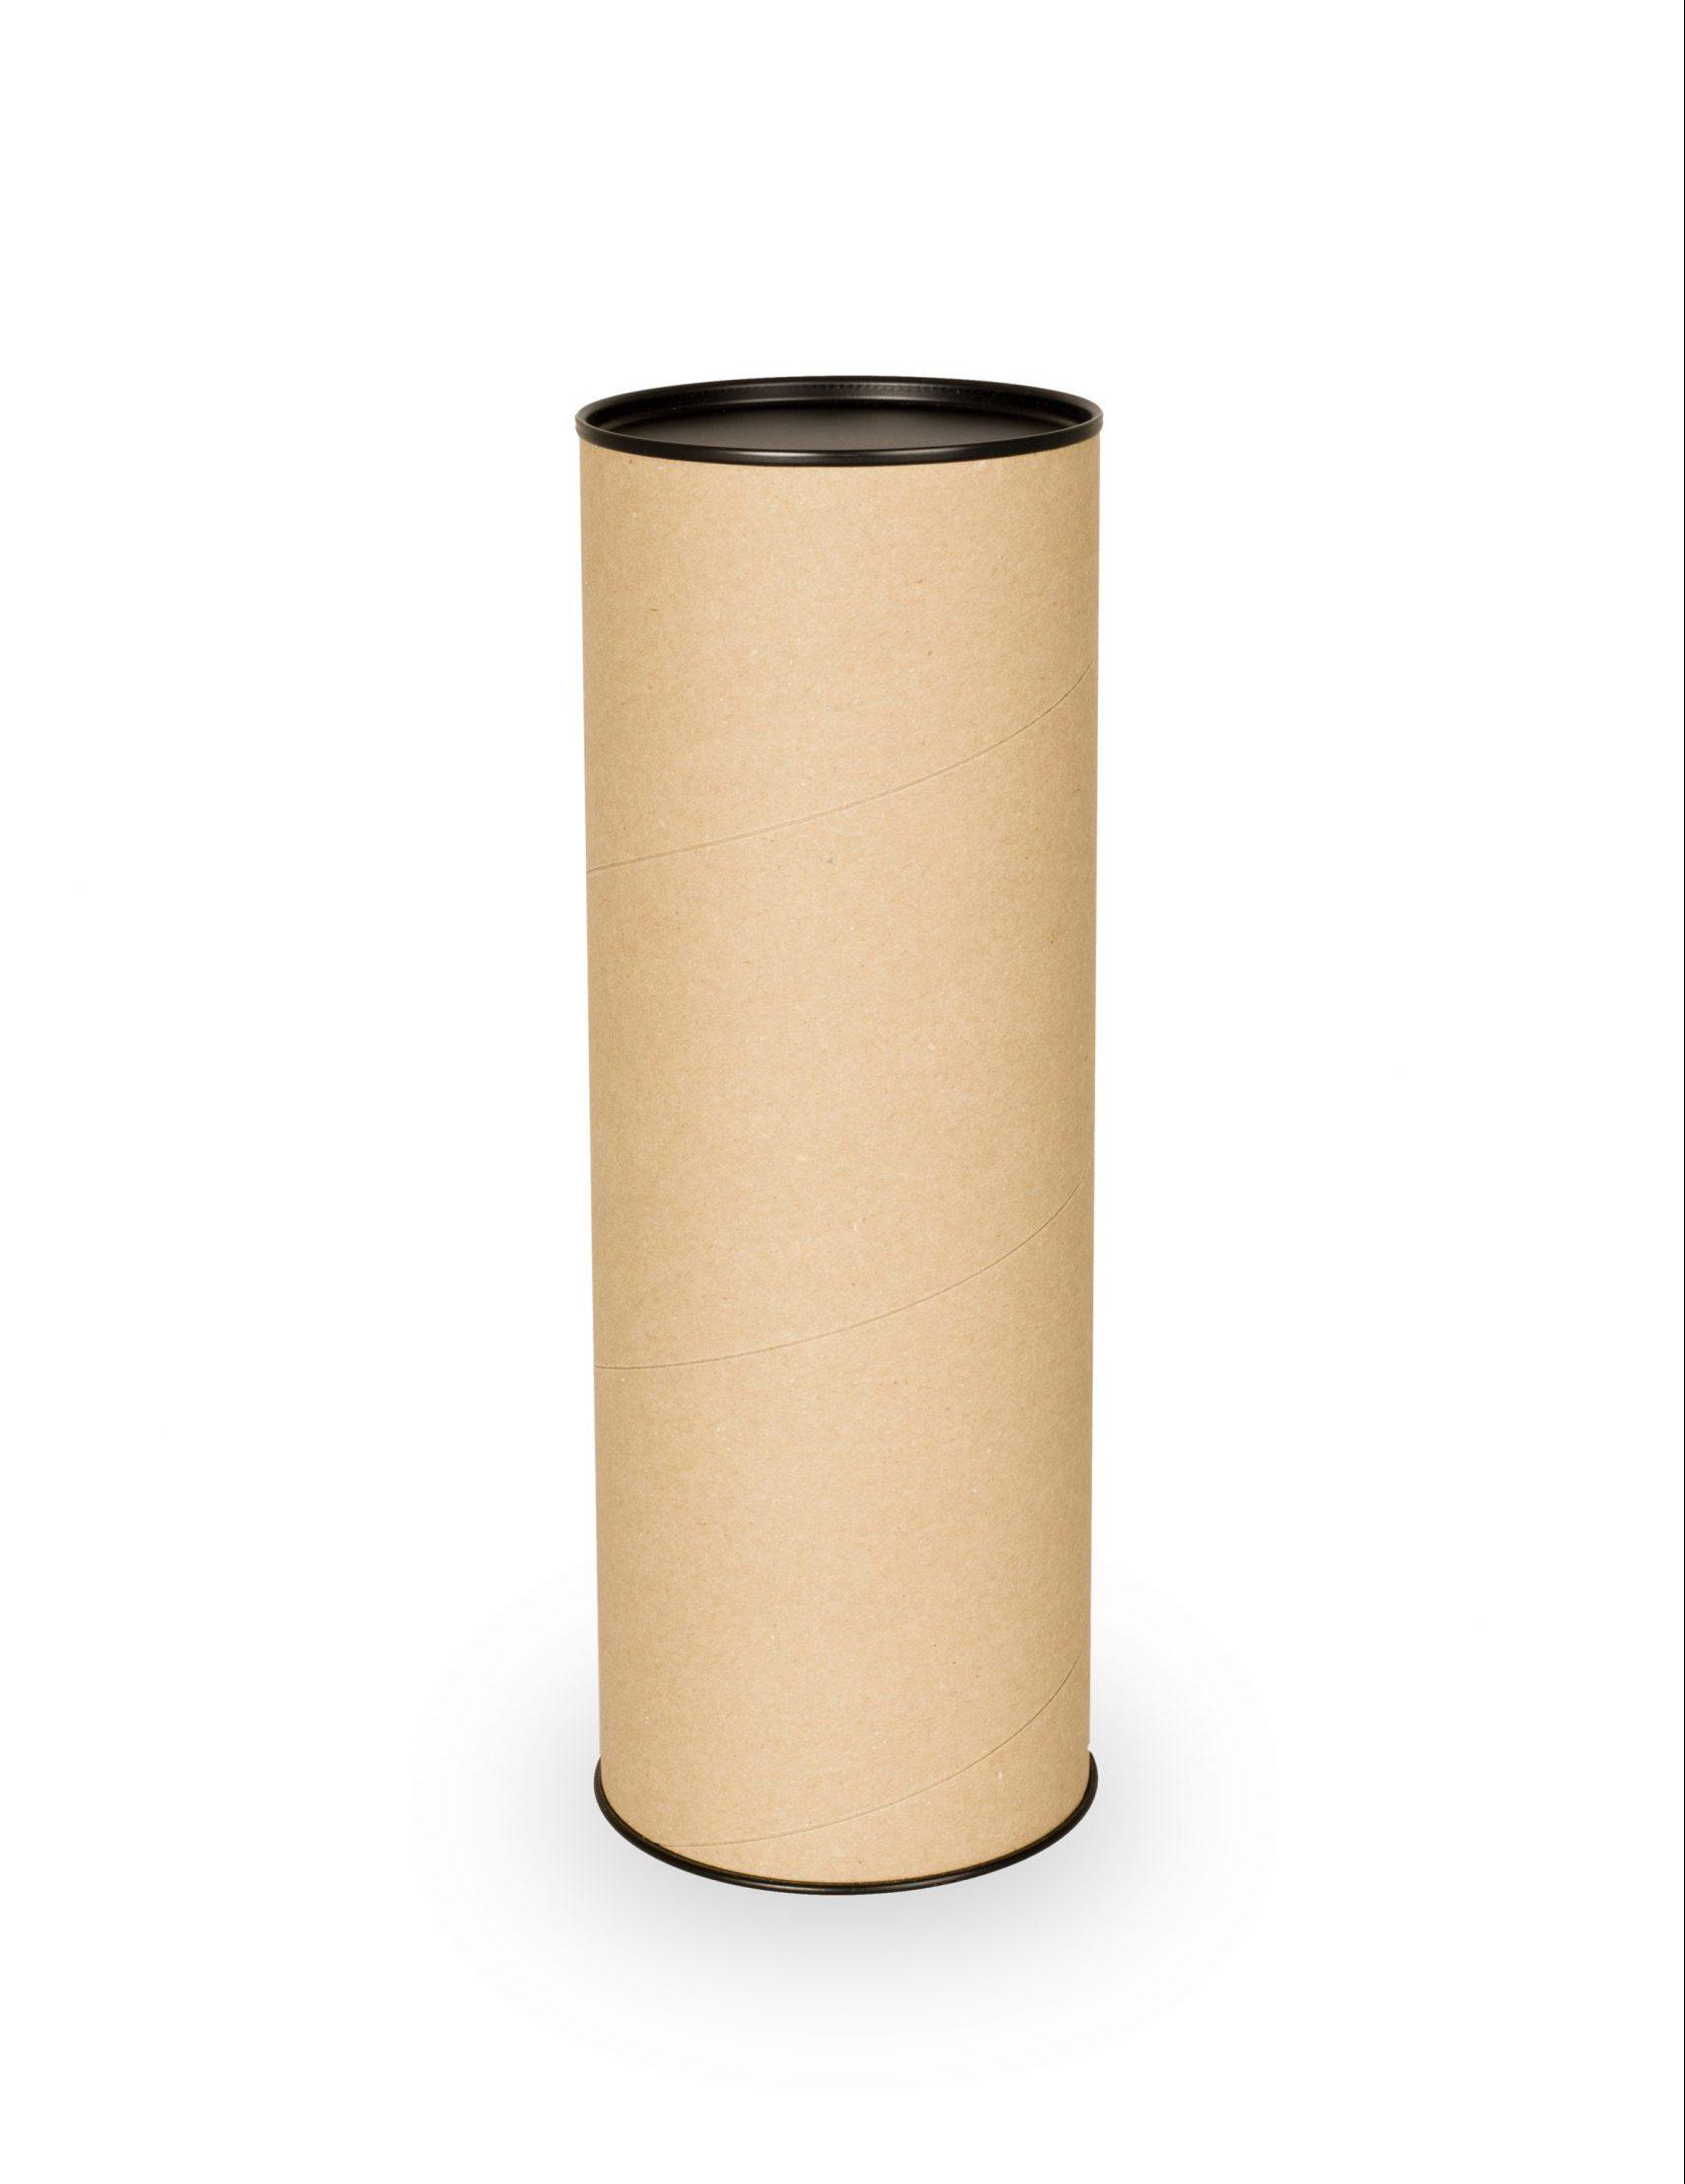 MMBverpakkingen_ kartonnen koker plastic deksel